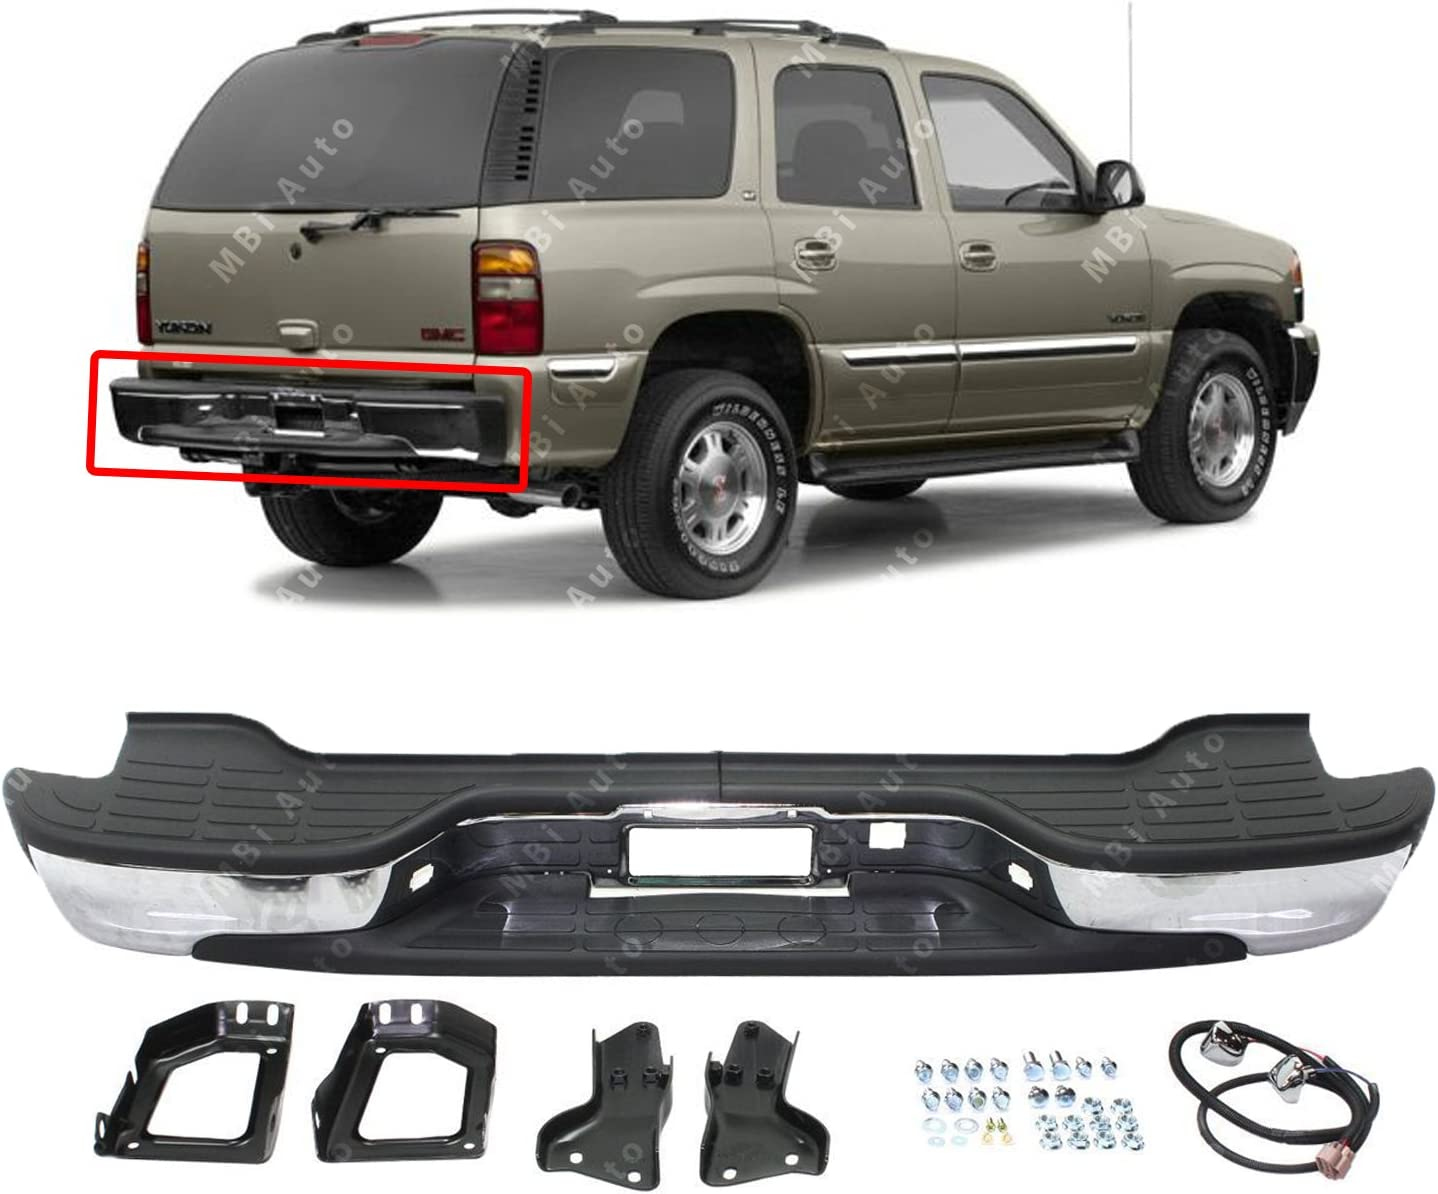 Brighter Design 7//8 Rear Bumper Accent Trim fits 2015-2018 Chevy Suburban